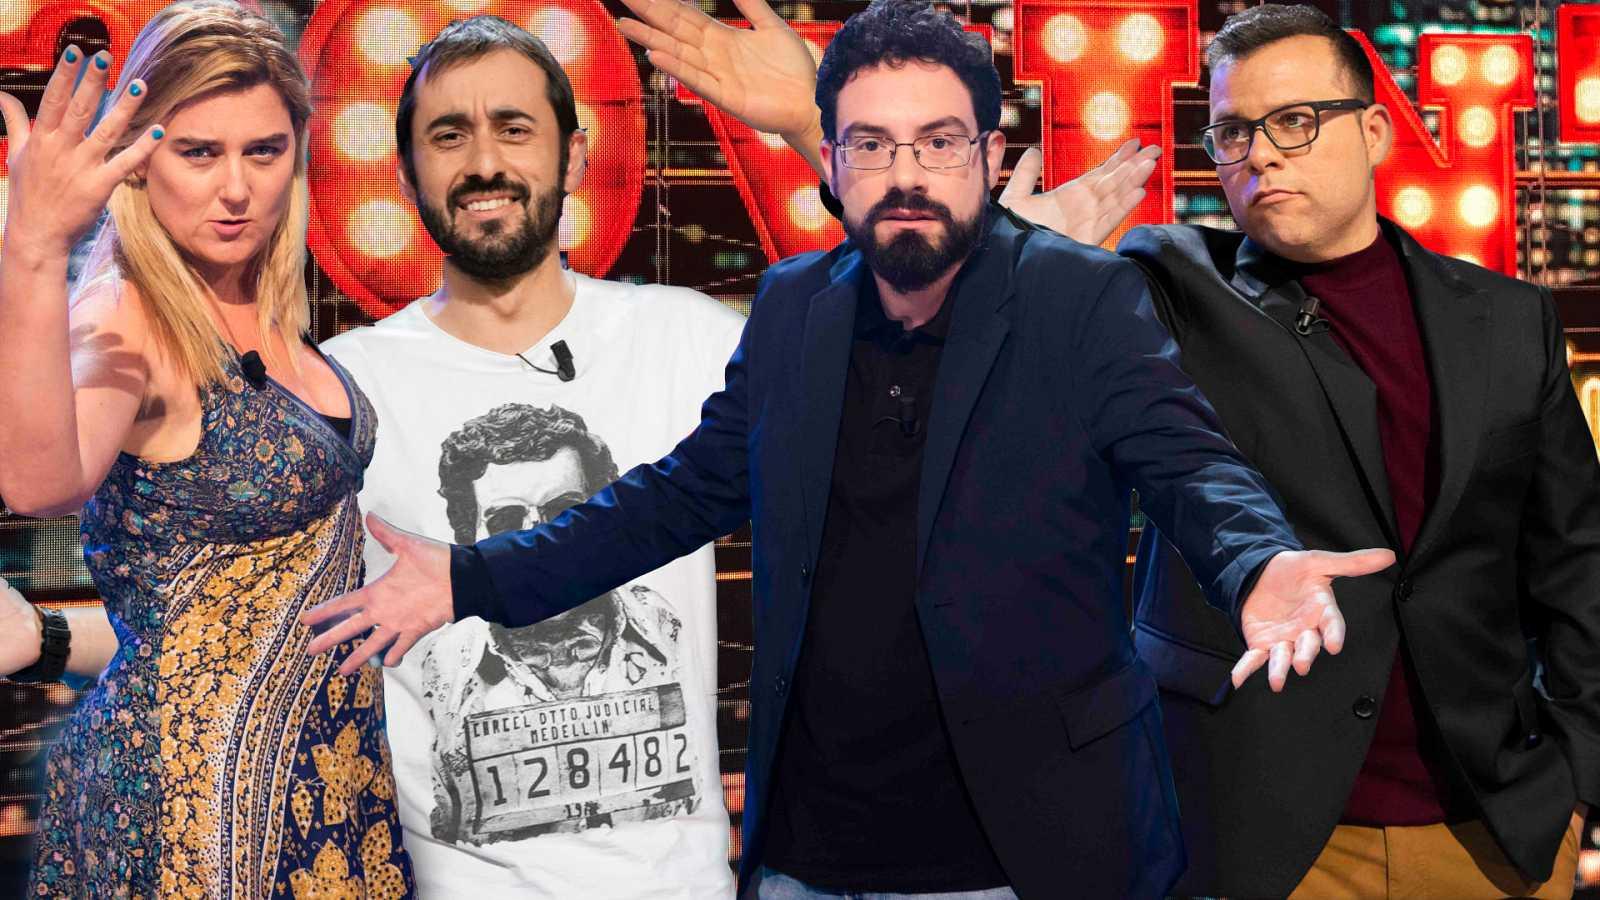 20Vint - Carlo Padial, Javi Sancho, Imma Sust, Toni Mata